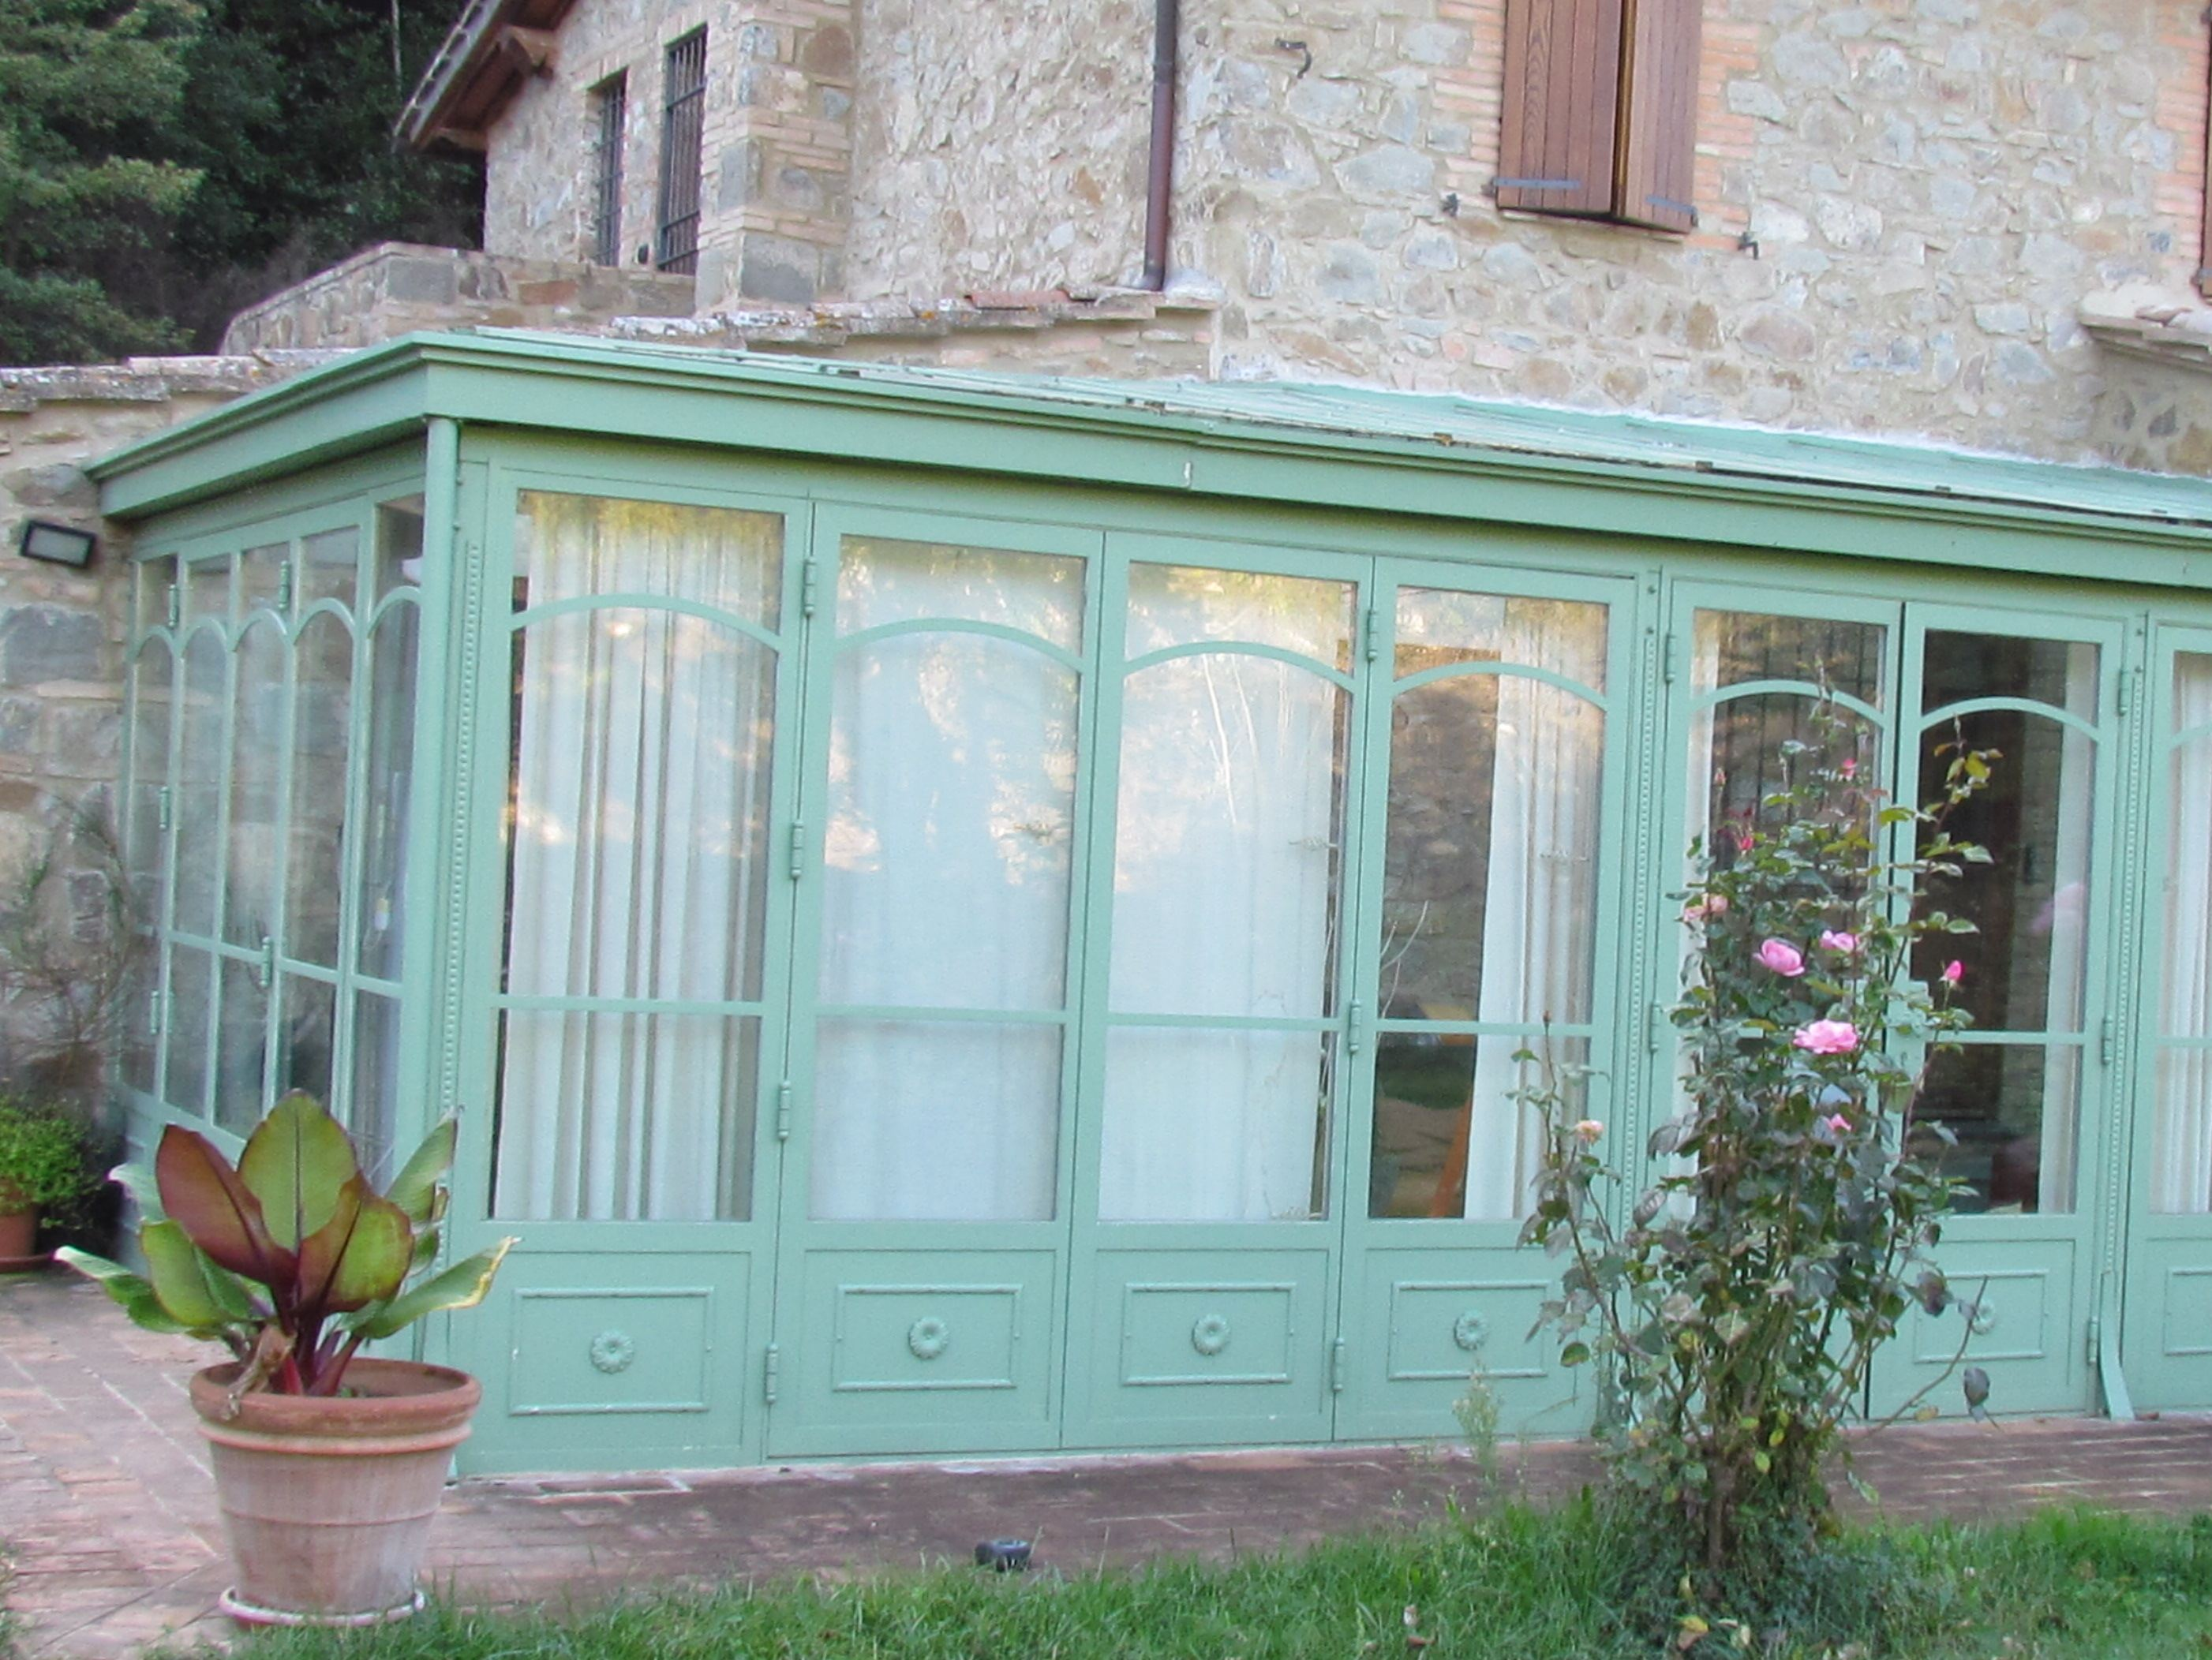 Giardino d 39 inverno 2 by garden house lazzerini - Giardino d inverno normativa ...